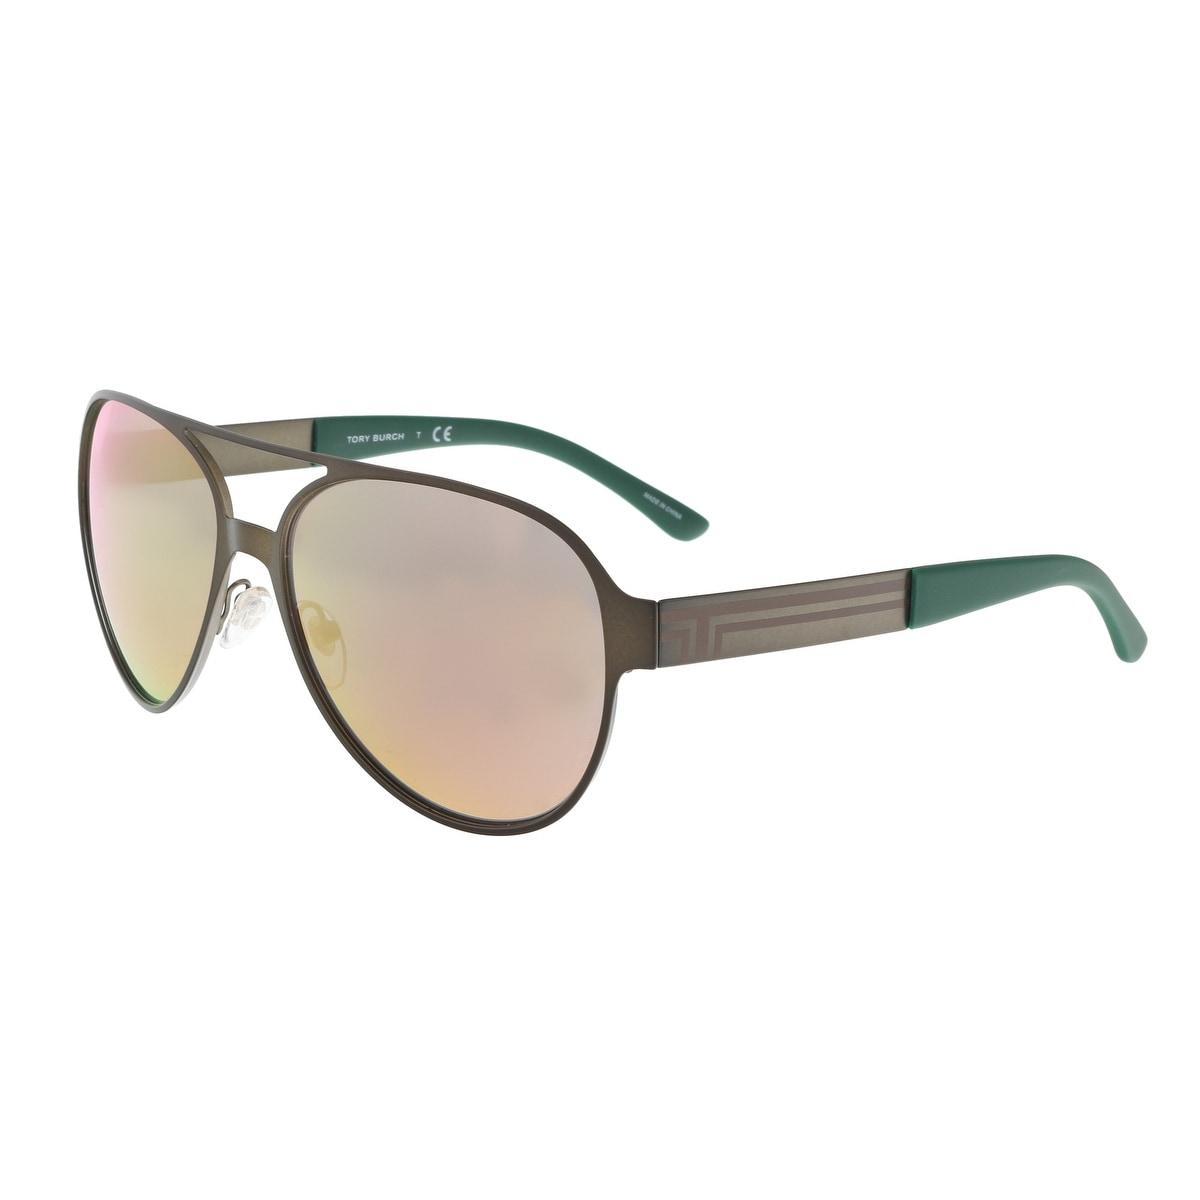 16e5d18e2c06 Tory Burch Sunglasses